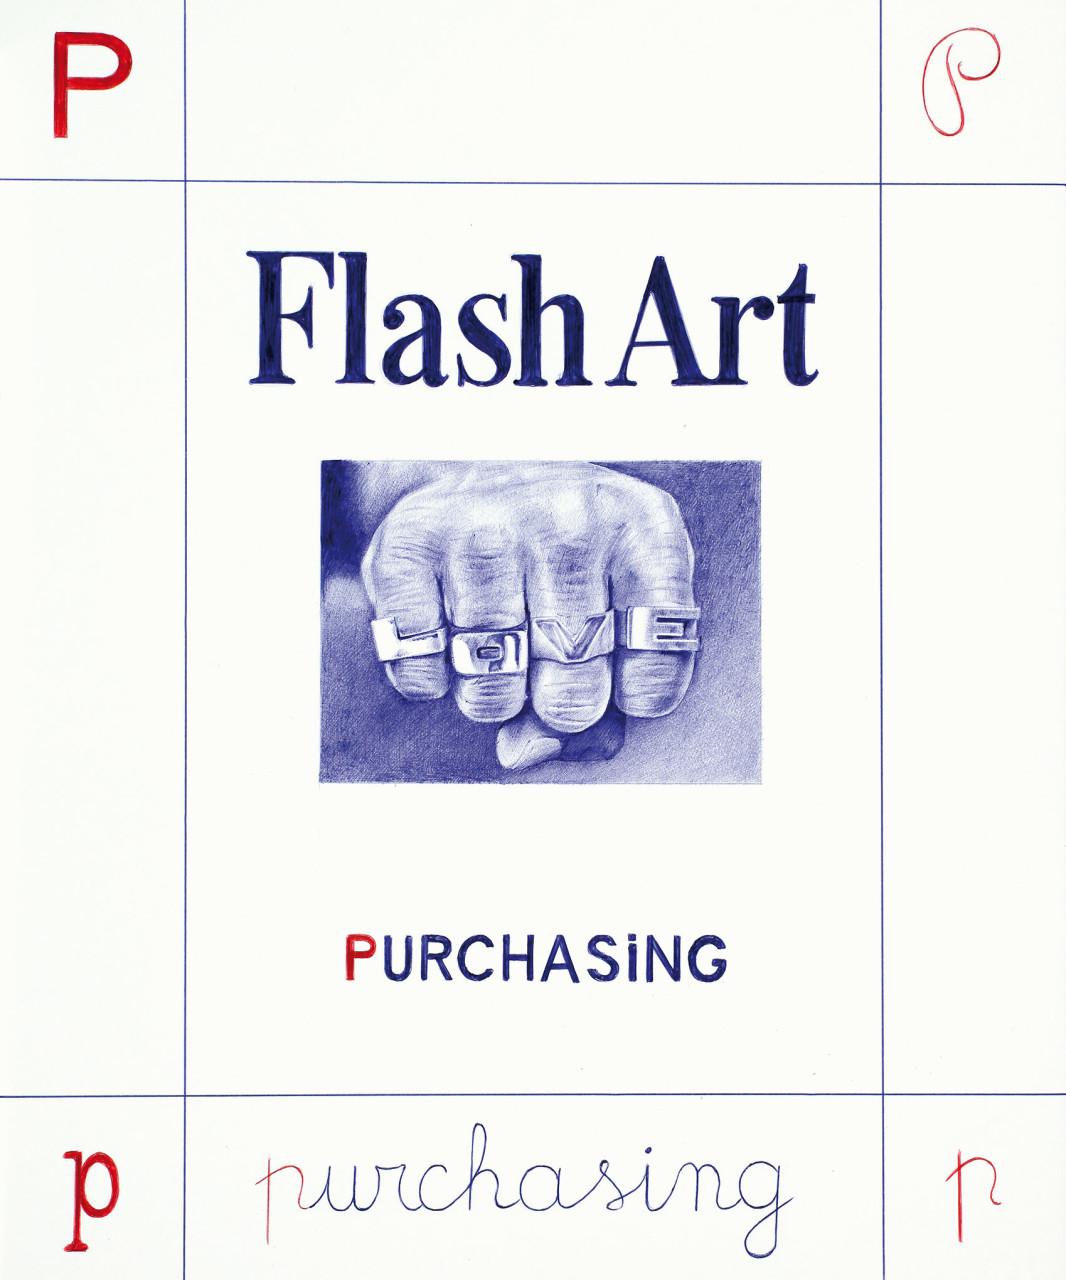 12P-purchasing_bassa